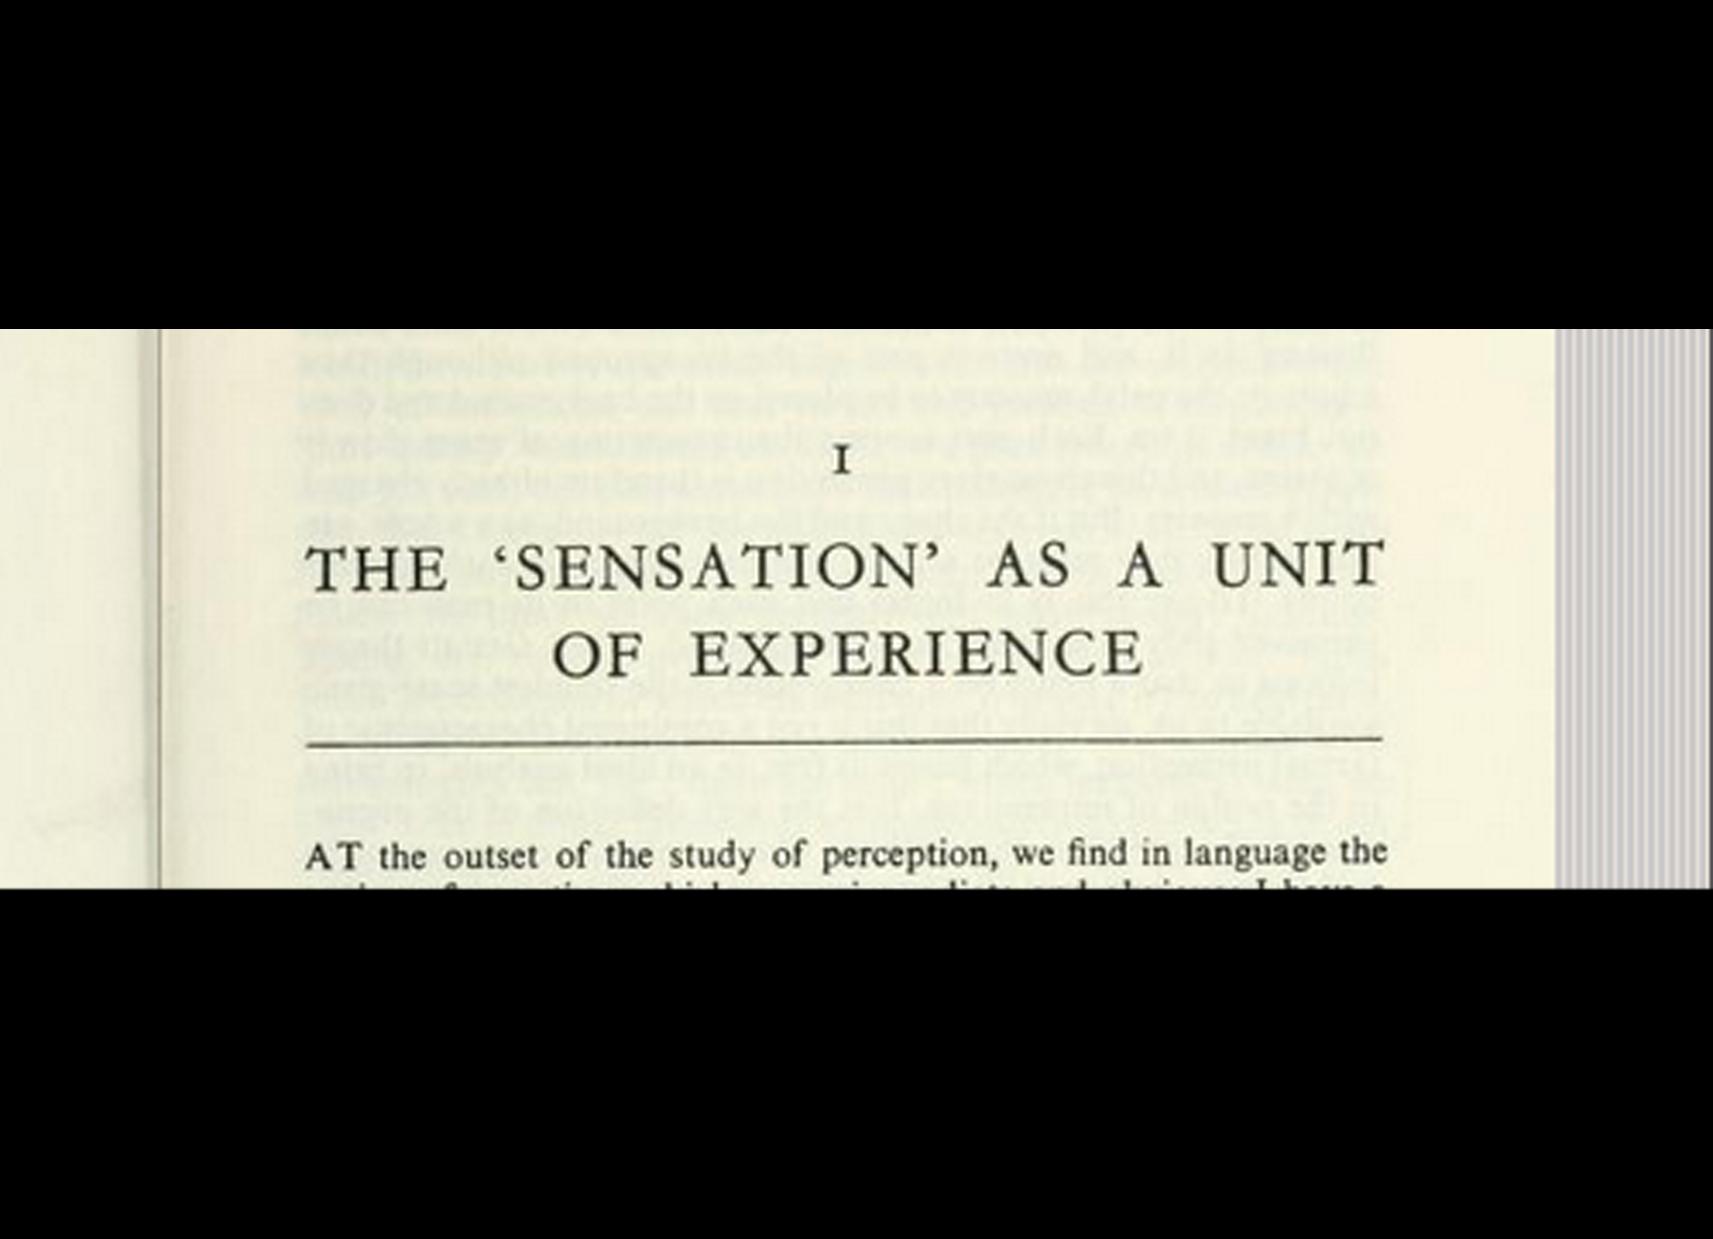 Excerpt from ' Phenomenology of perception', Merleau-Ponty